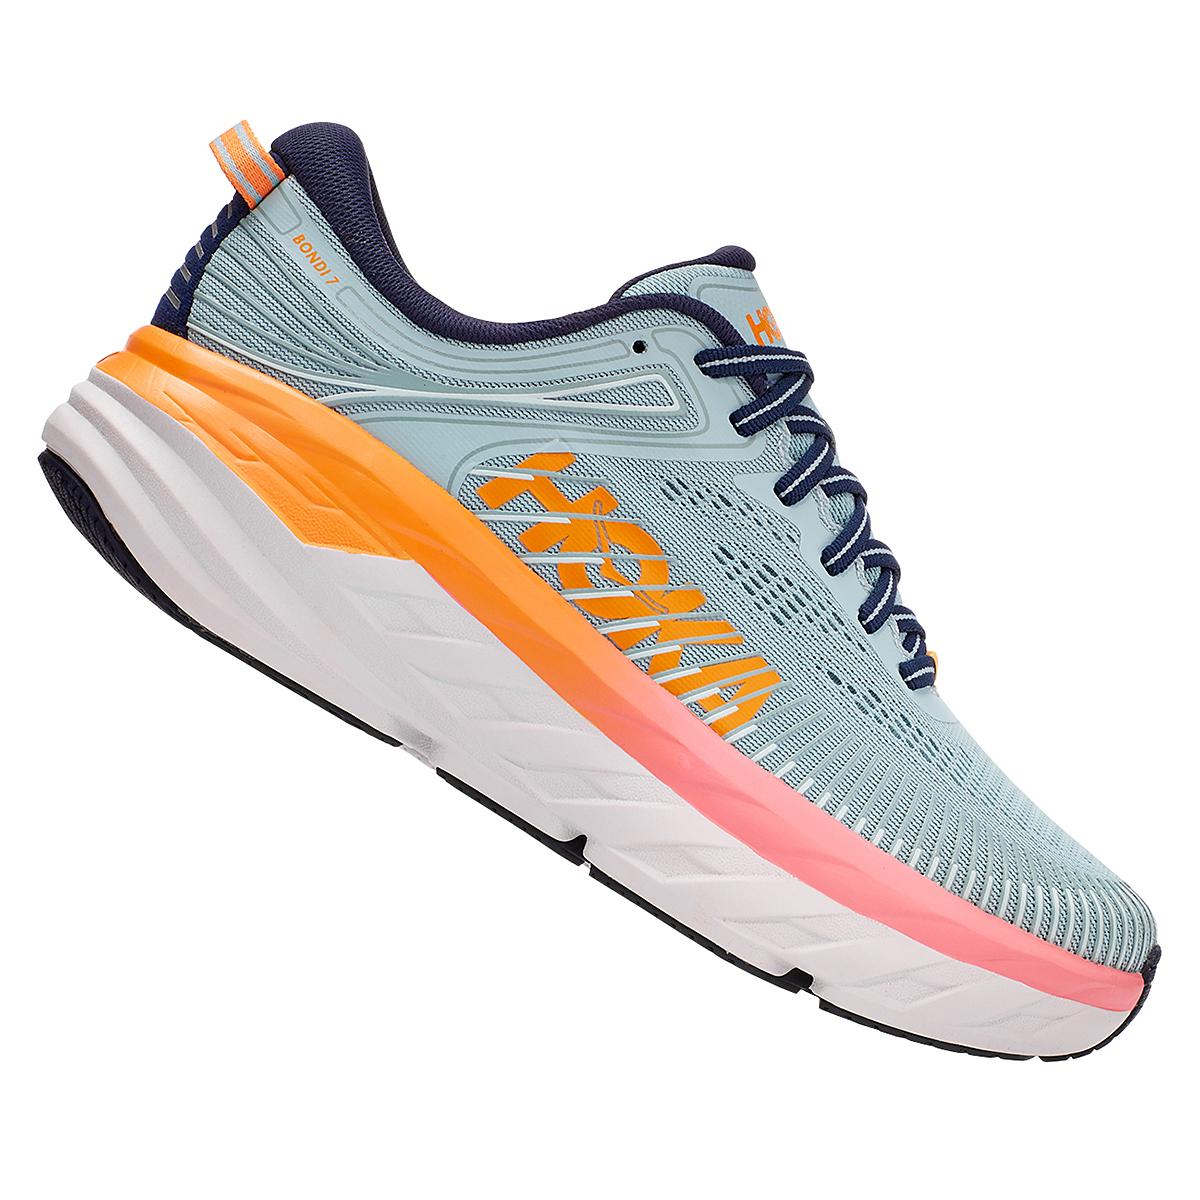 Women's Hoka One One Bondi 7 Running Shoe - Color: Blue Haze/Black Iris - Size: 5.5 - Width: Regular, Blue Haze/Black Iris, large, image 4